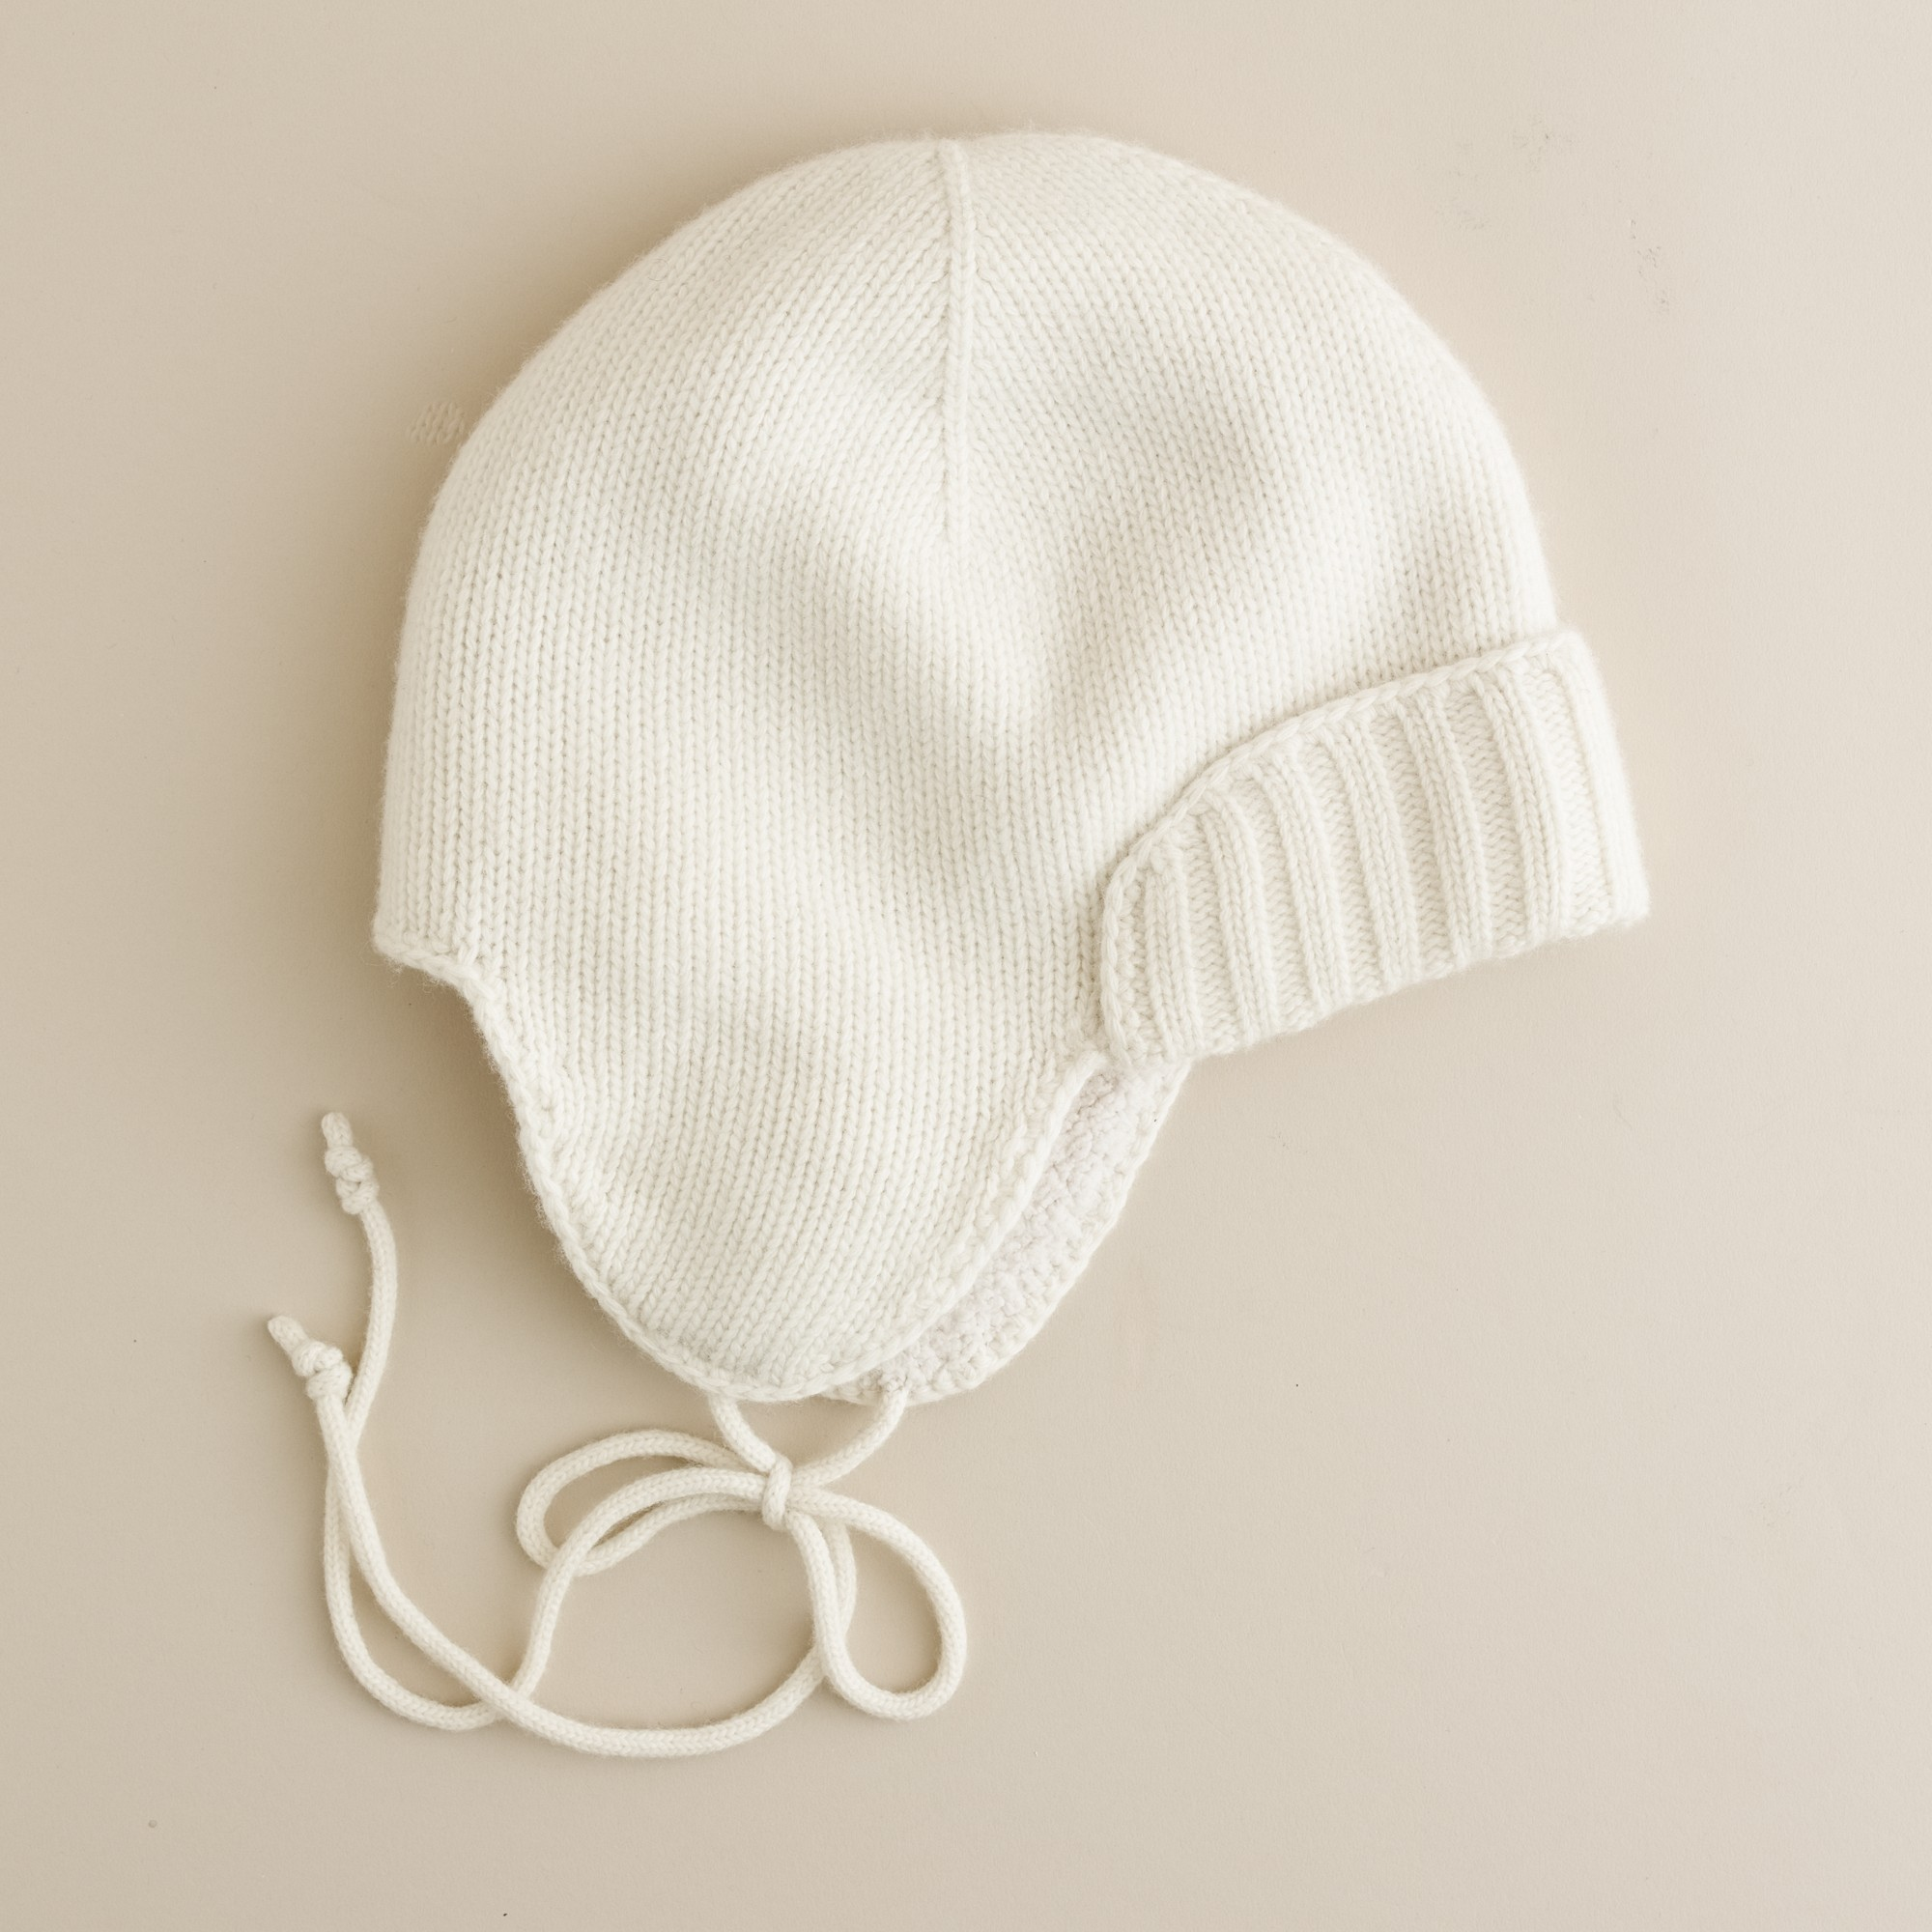 J.crew Hearthstone Trapper Hat